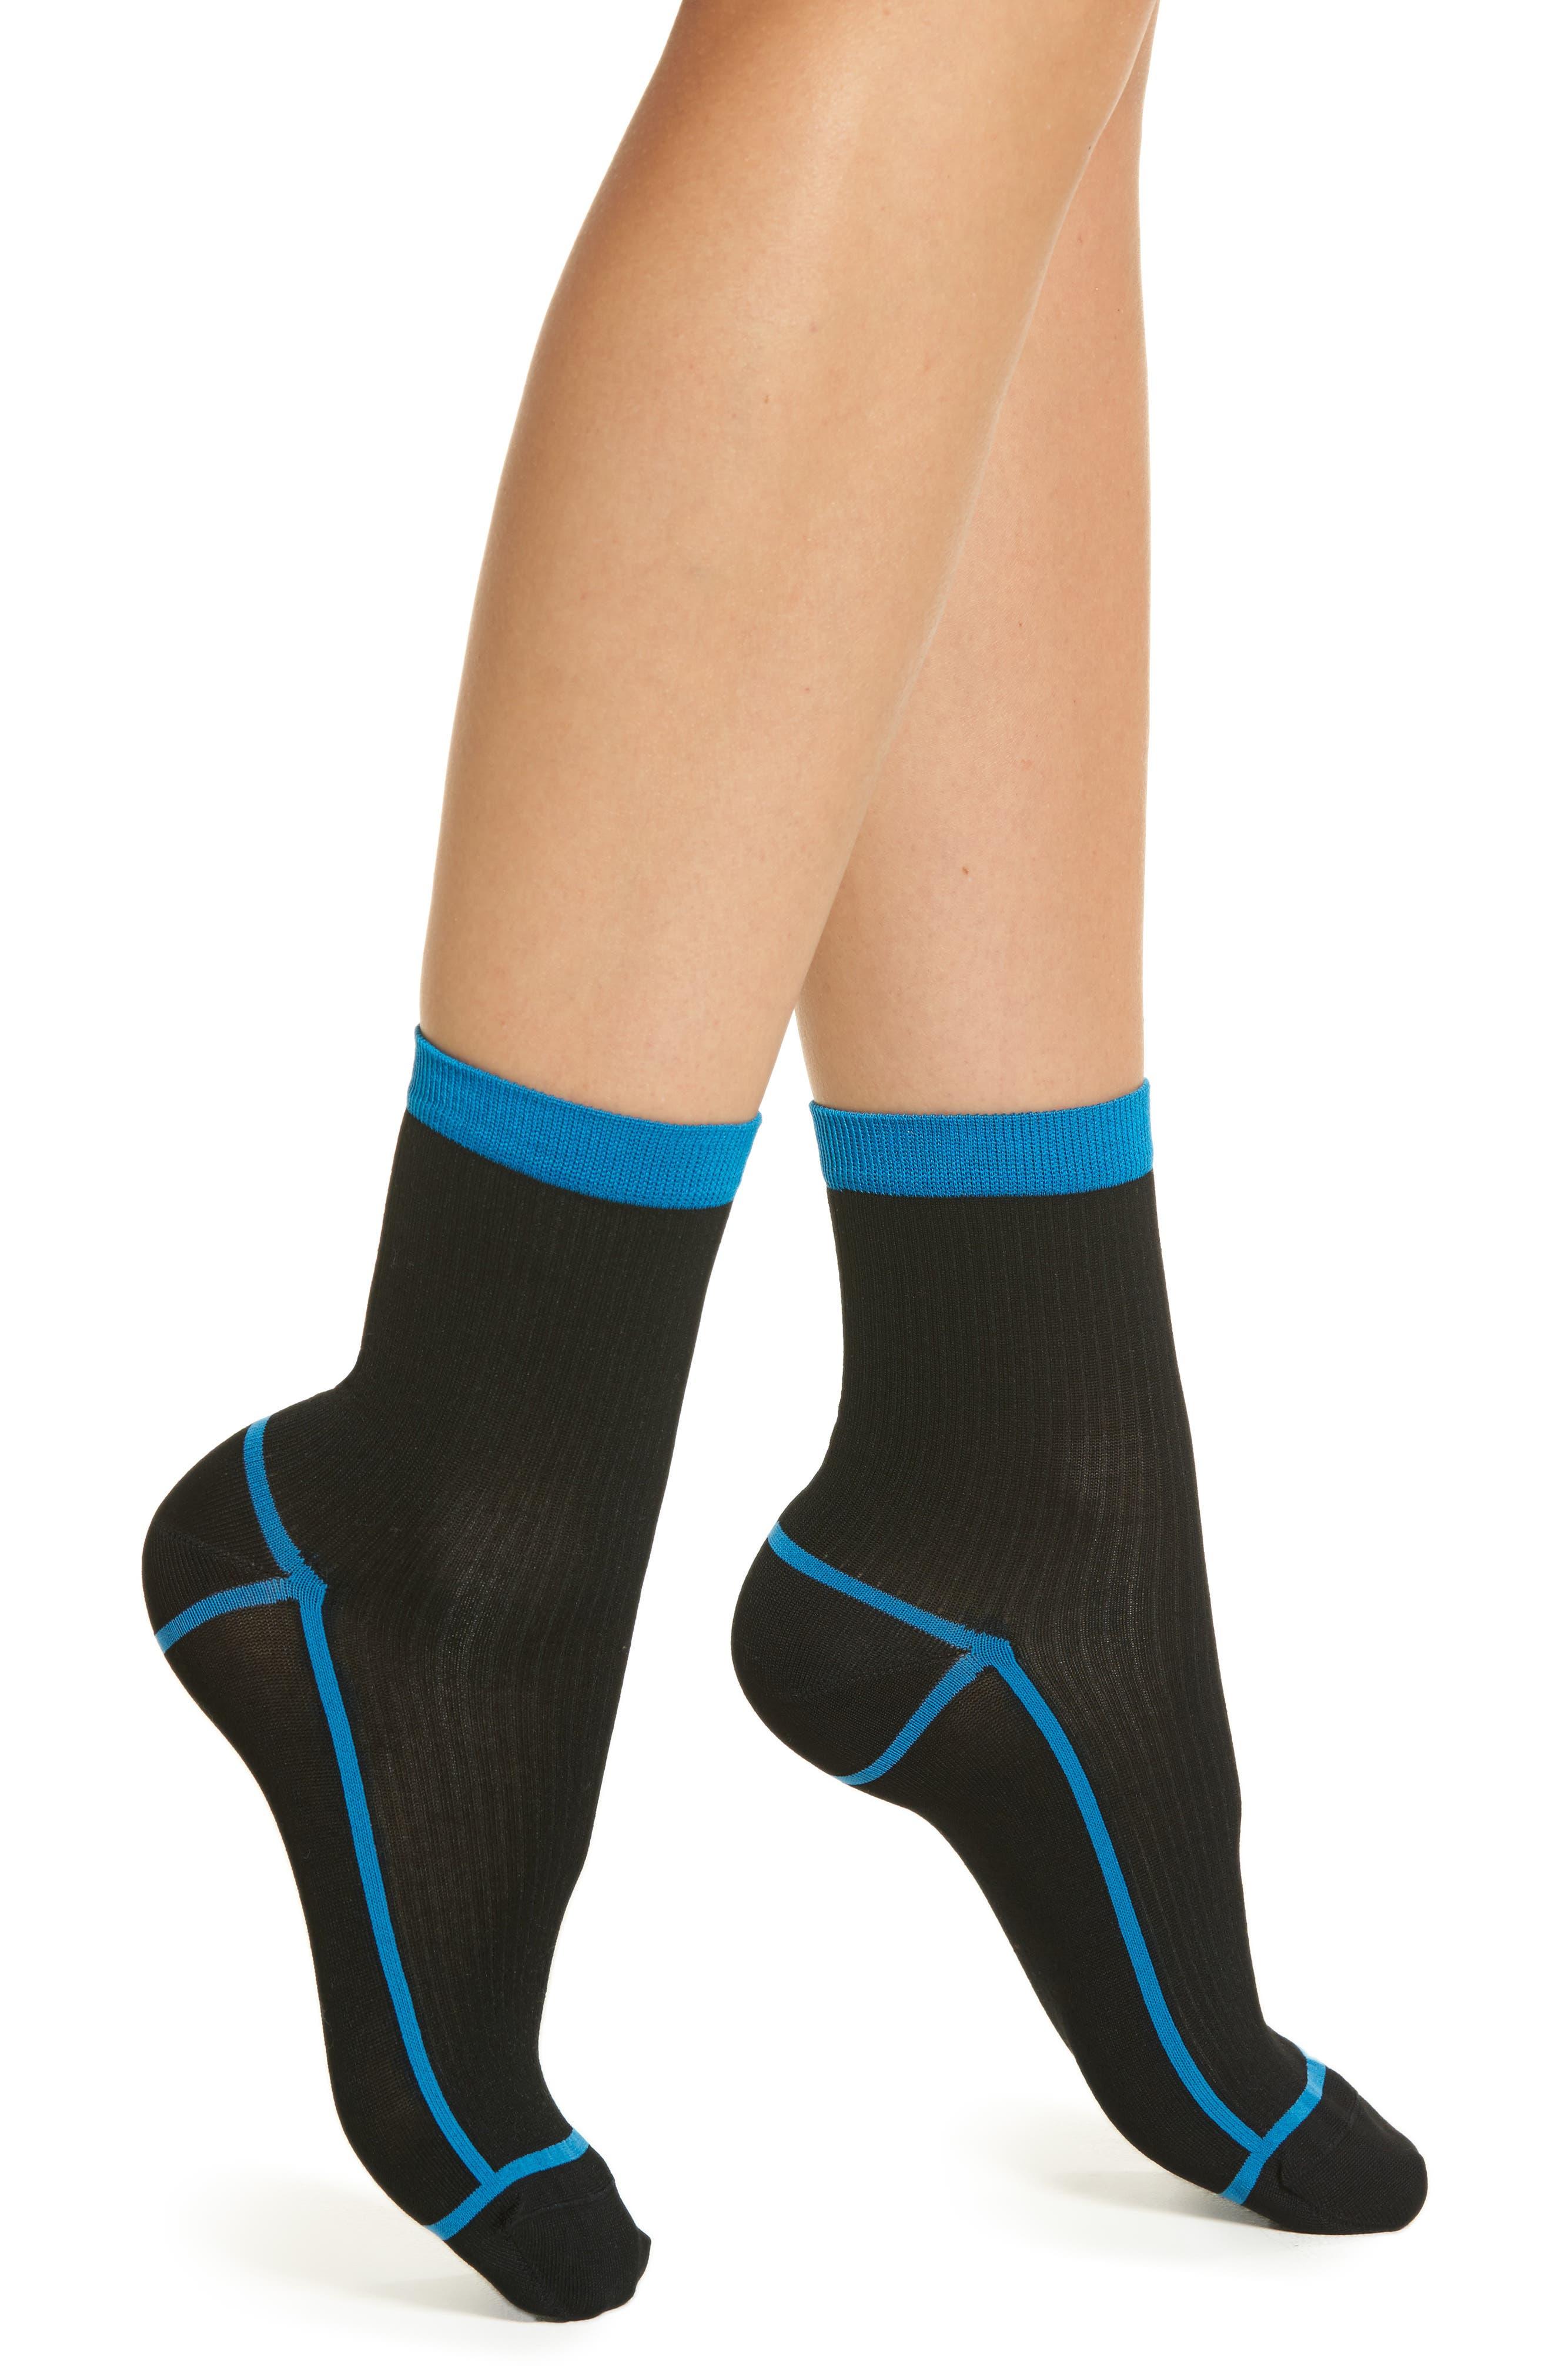 Lily Rib Ankle Socks,                             Main thumbnail 1, color,                             Black